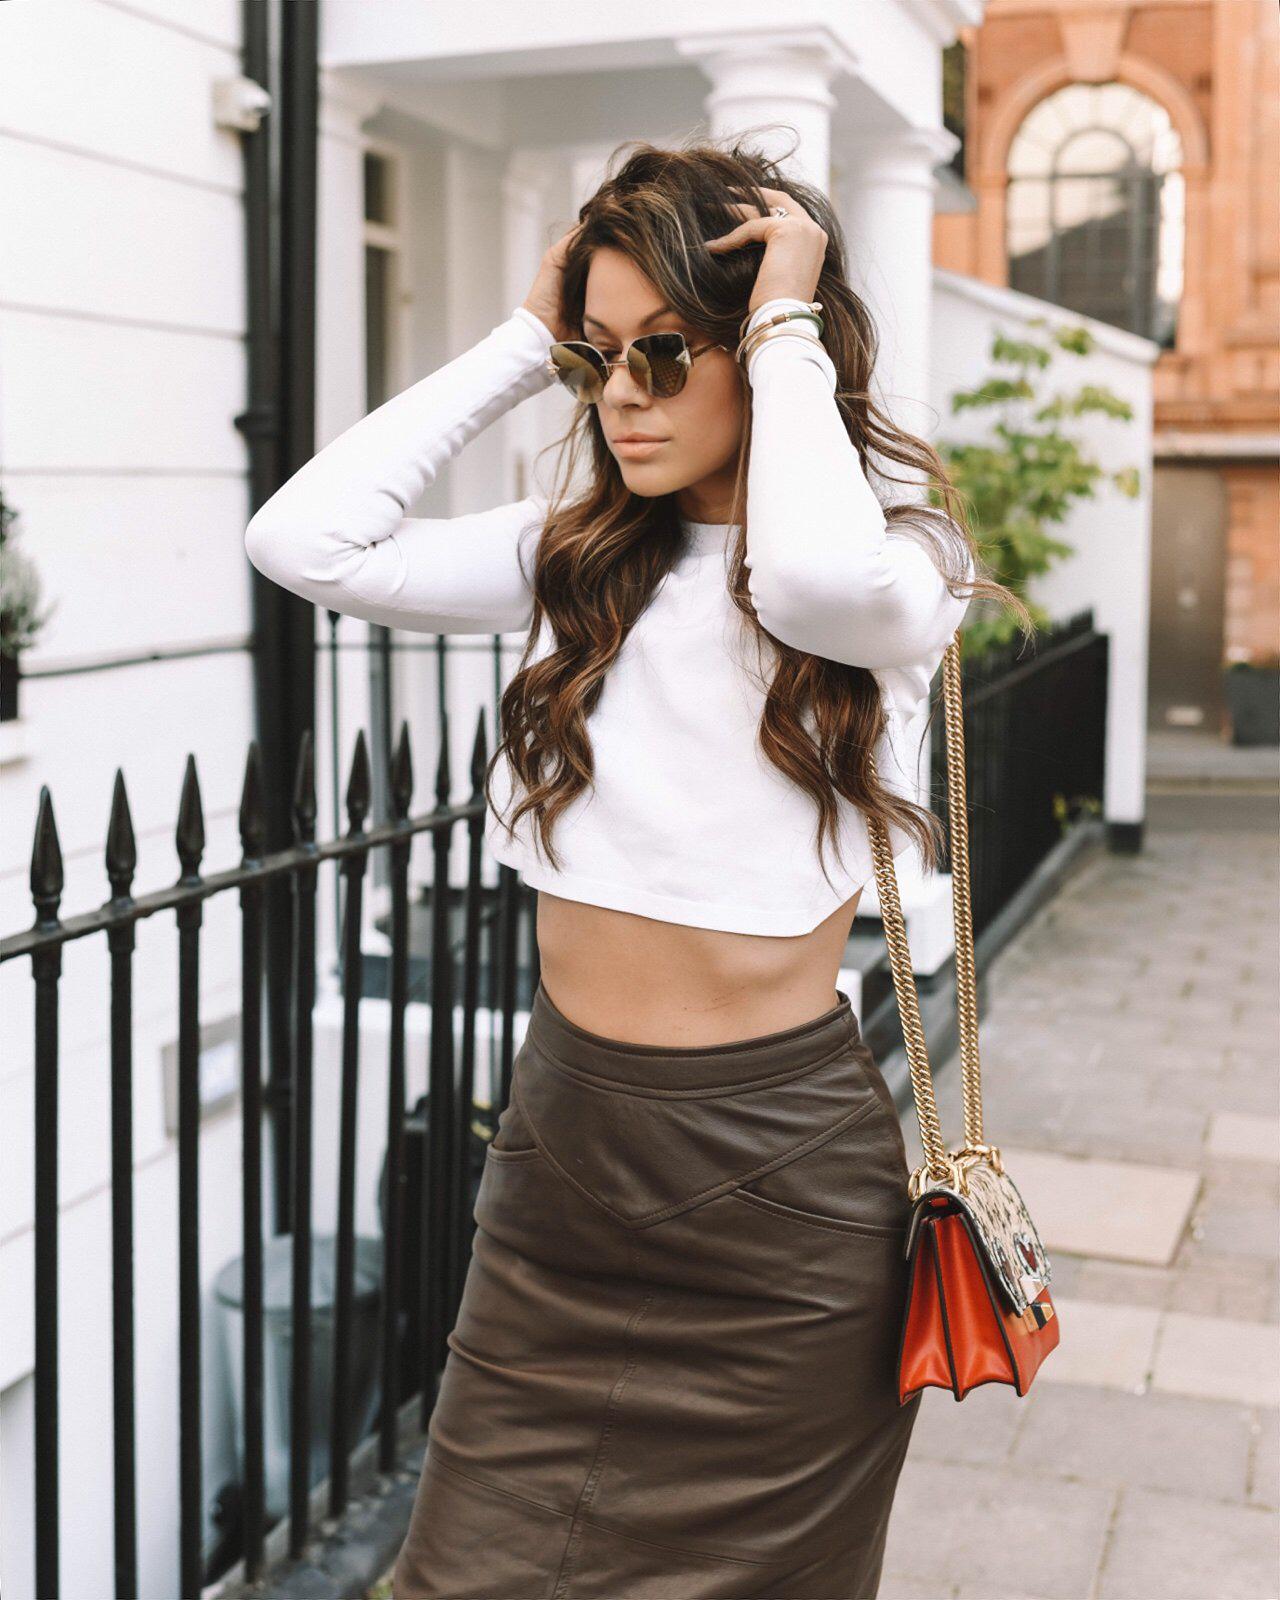 Fendi sunglasses and crop top